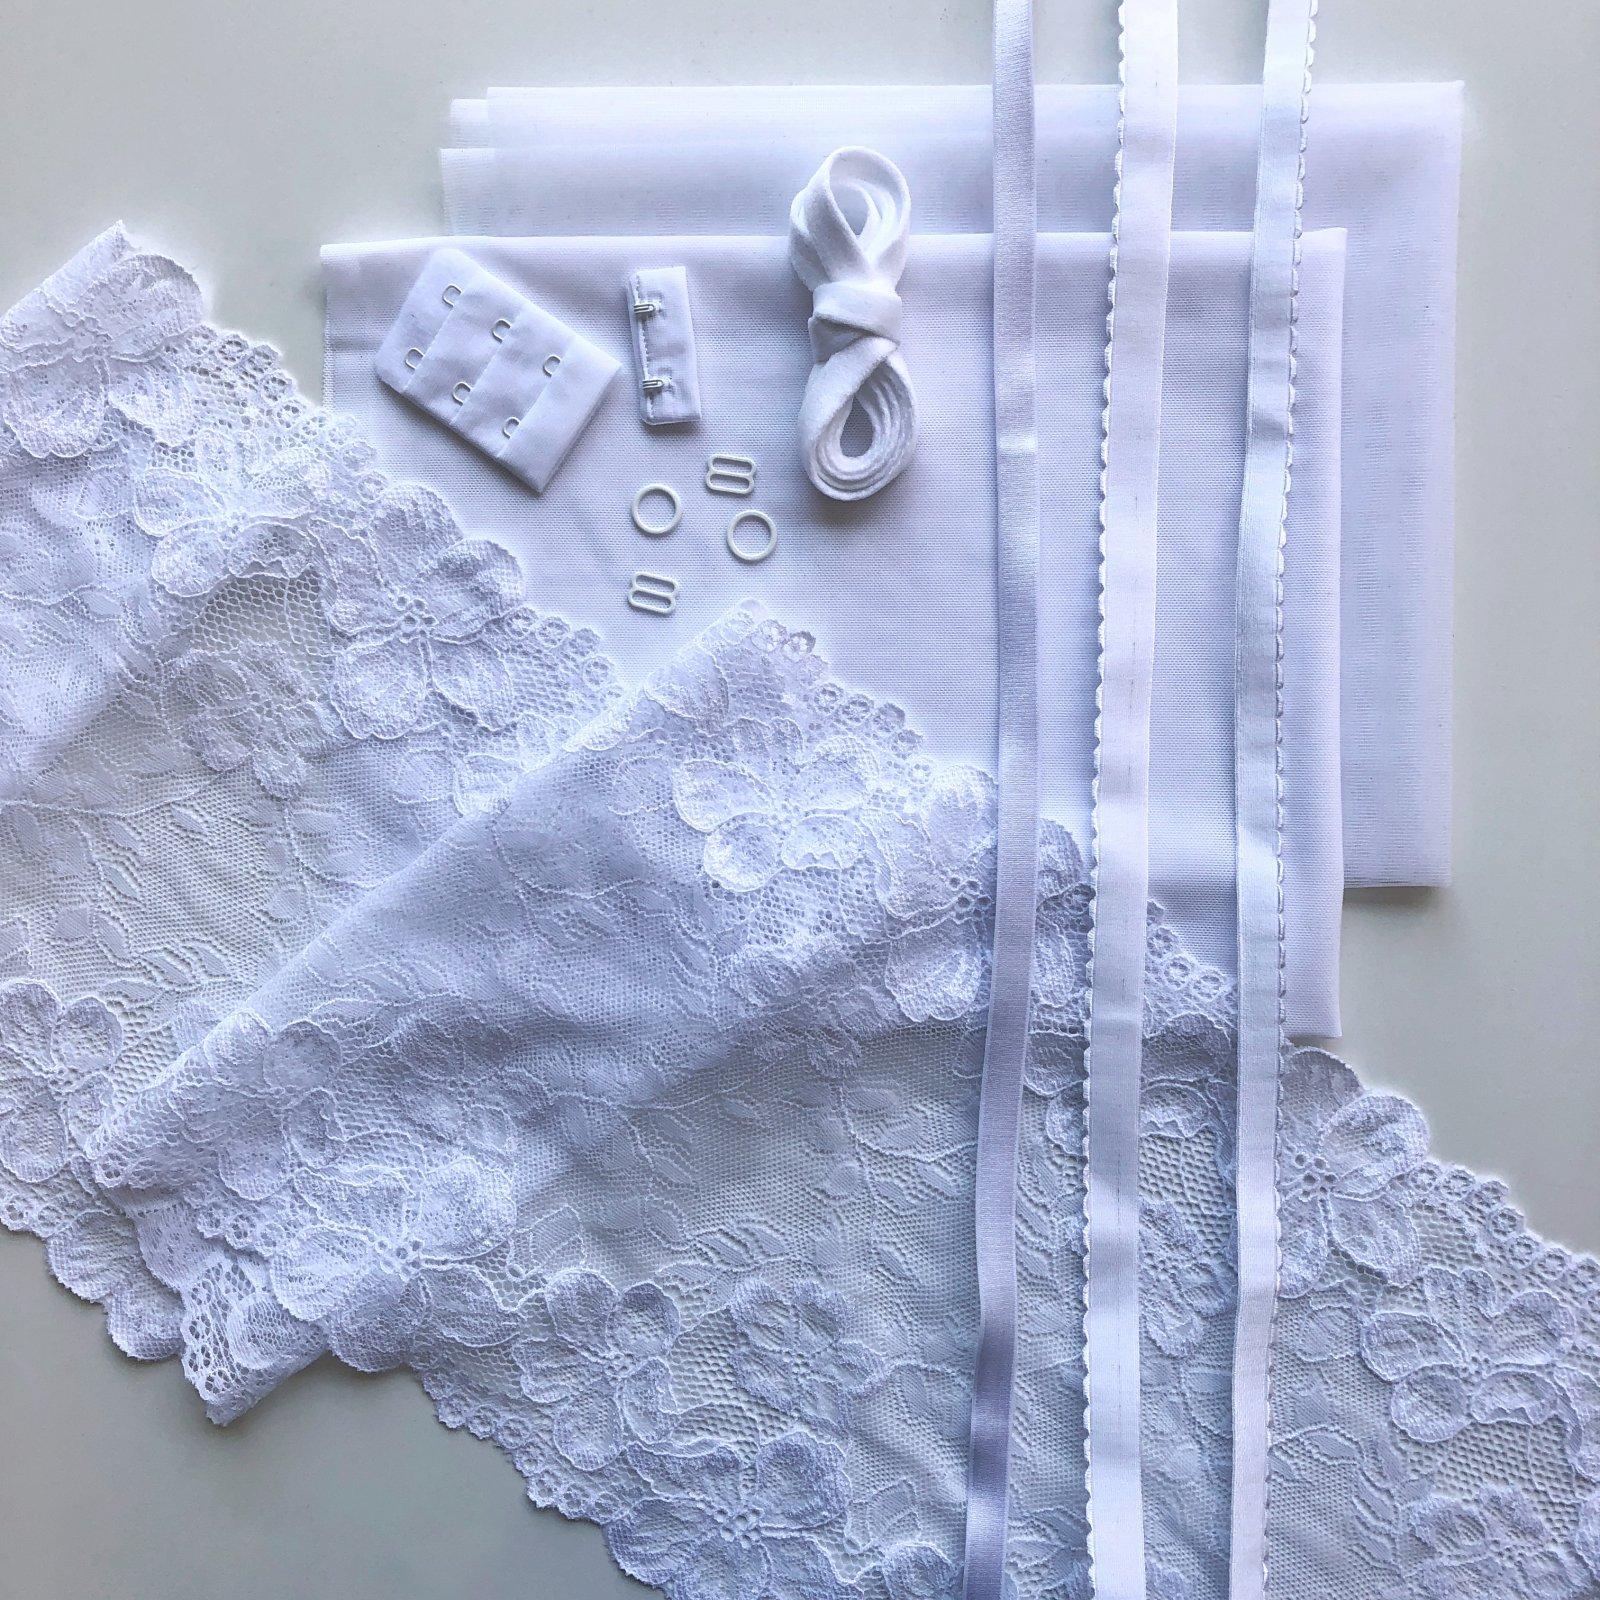 Lace Underwire Bra Kit - White